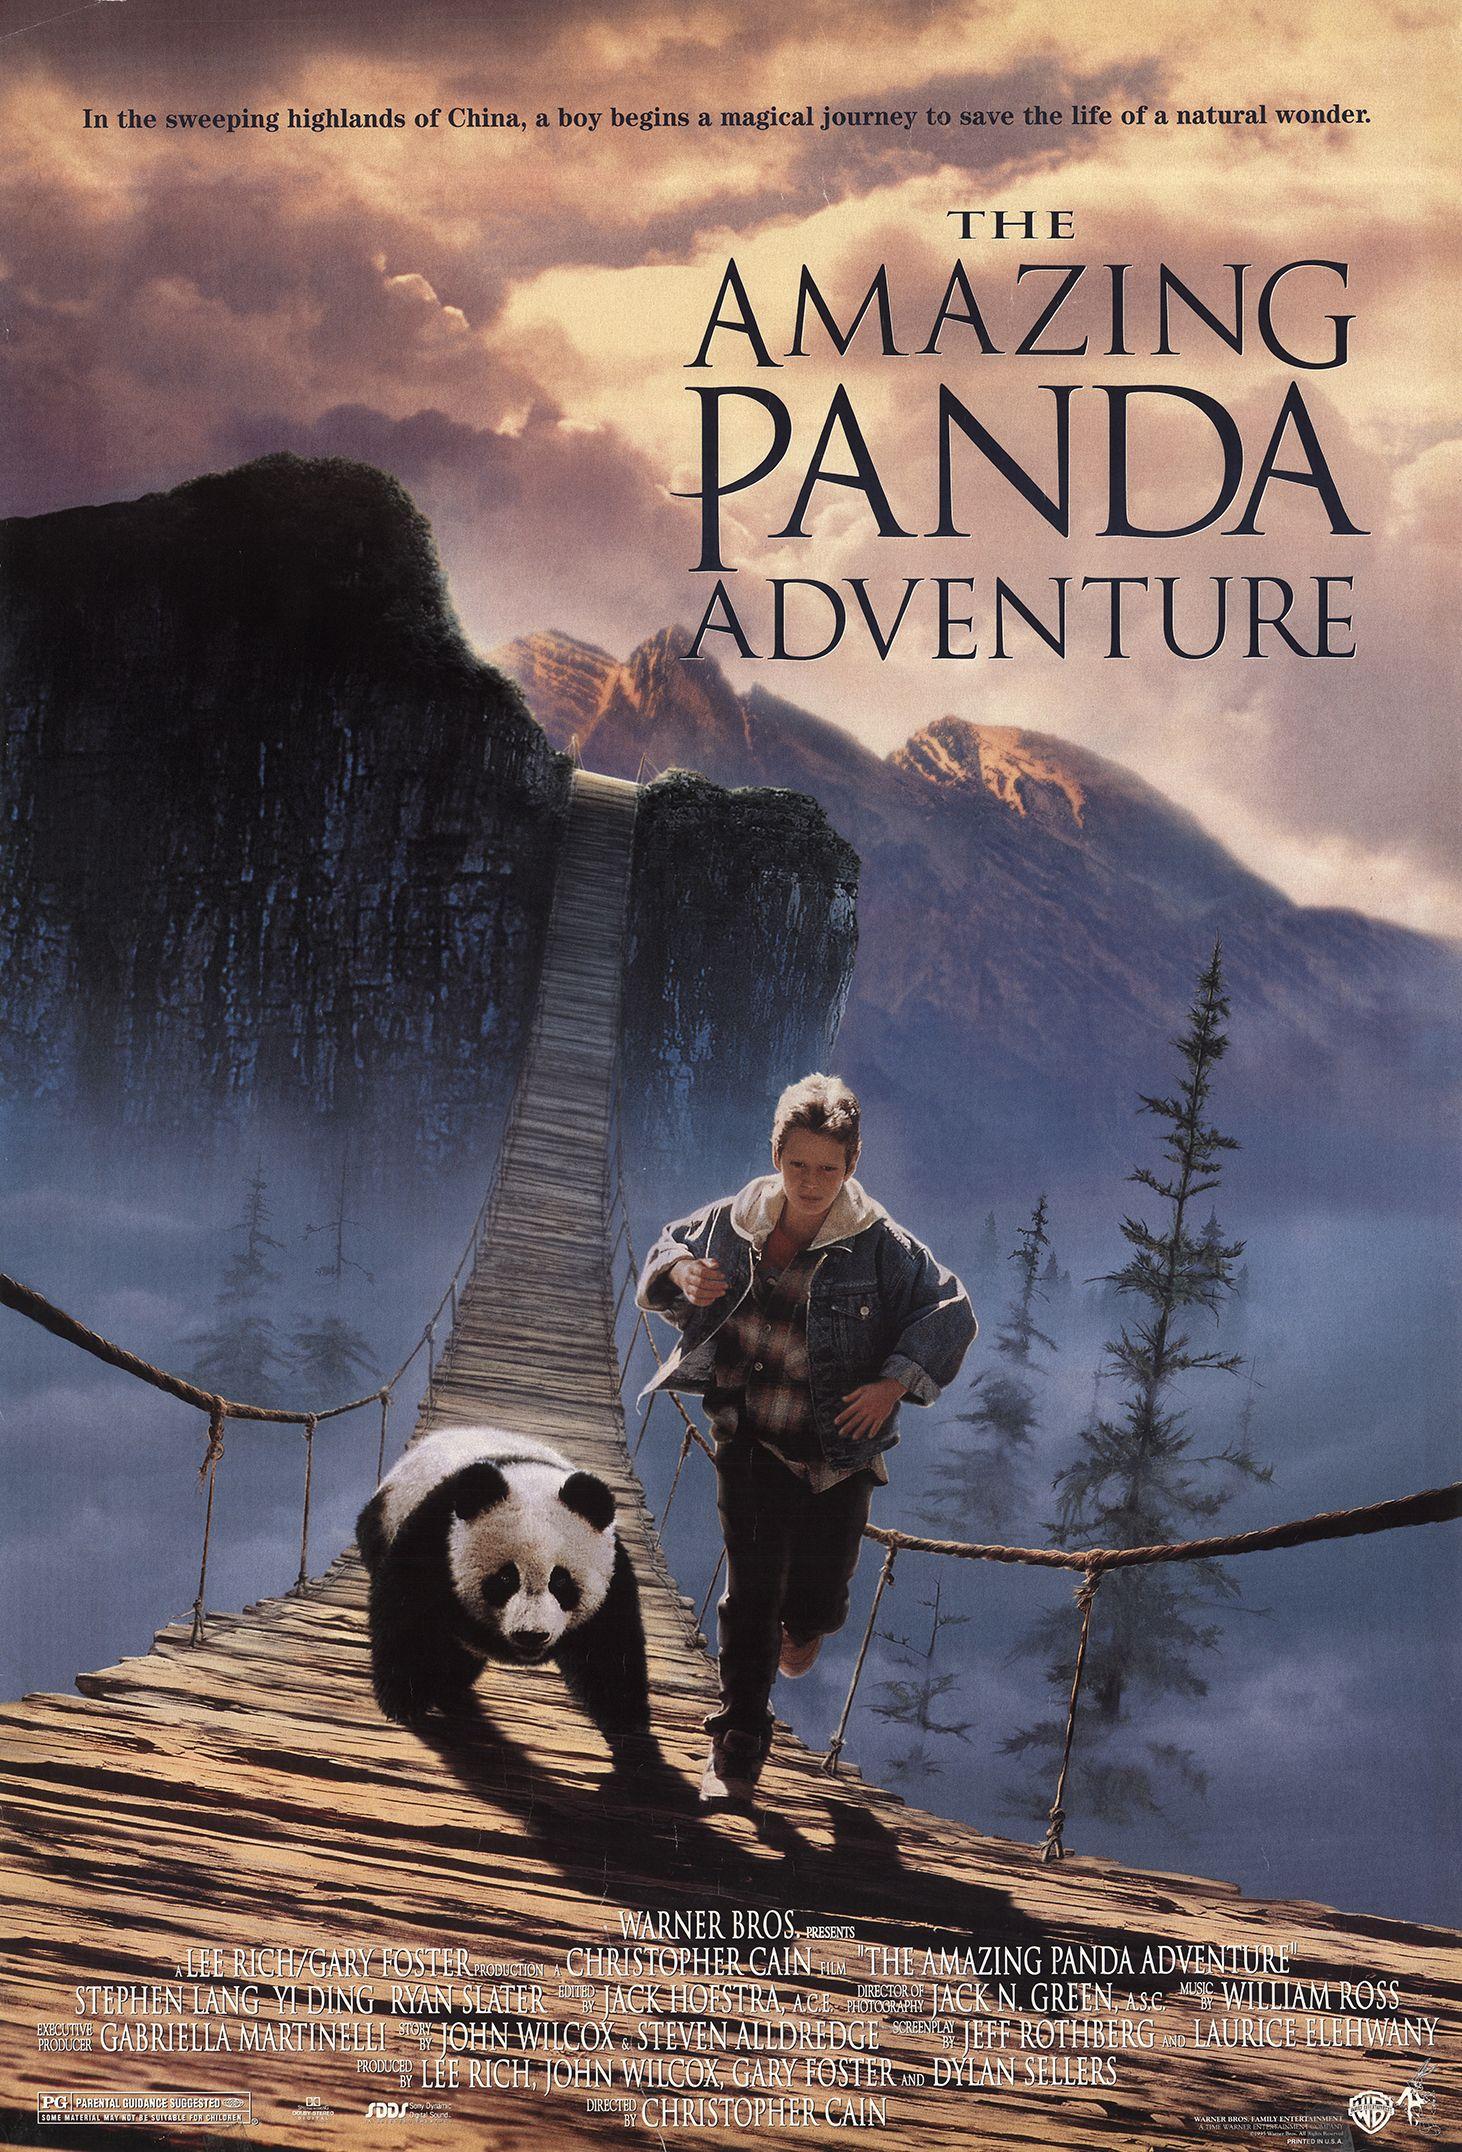 The Amazing Panda Adventure (1995)